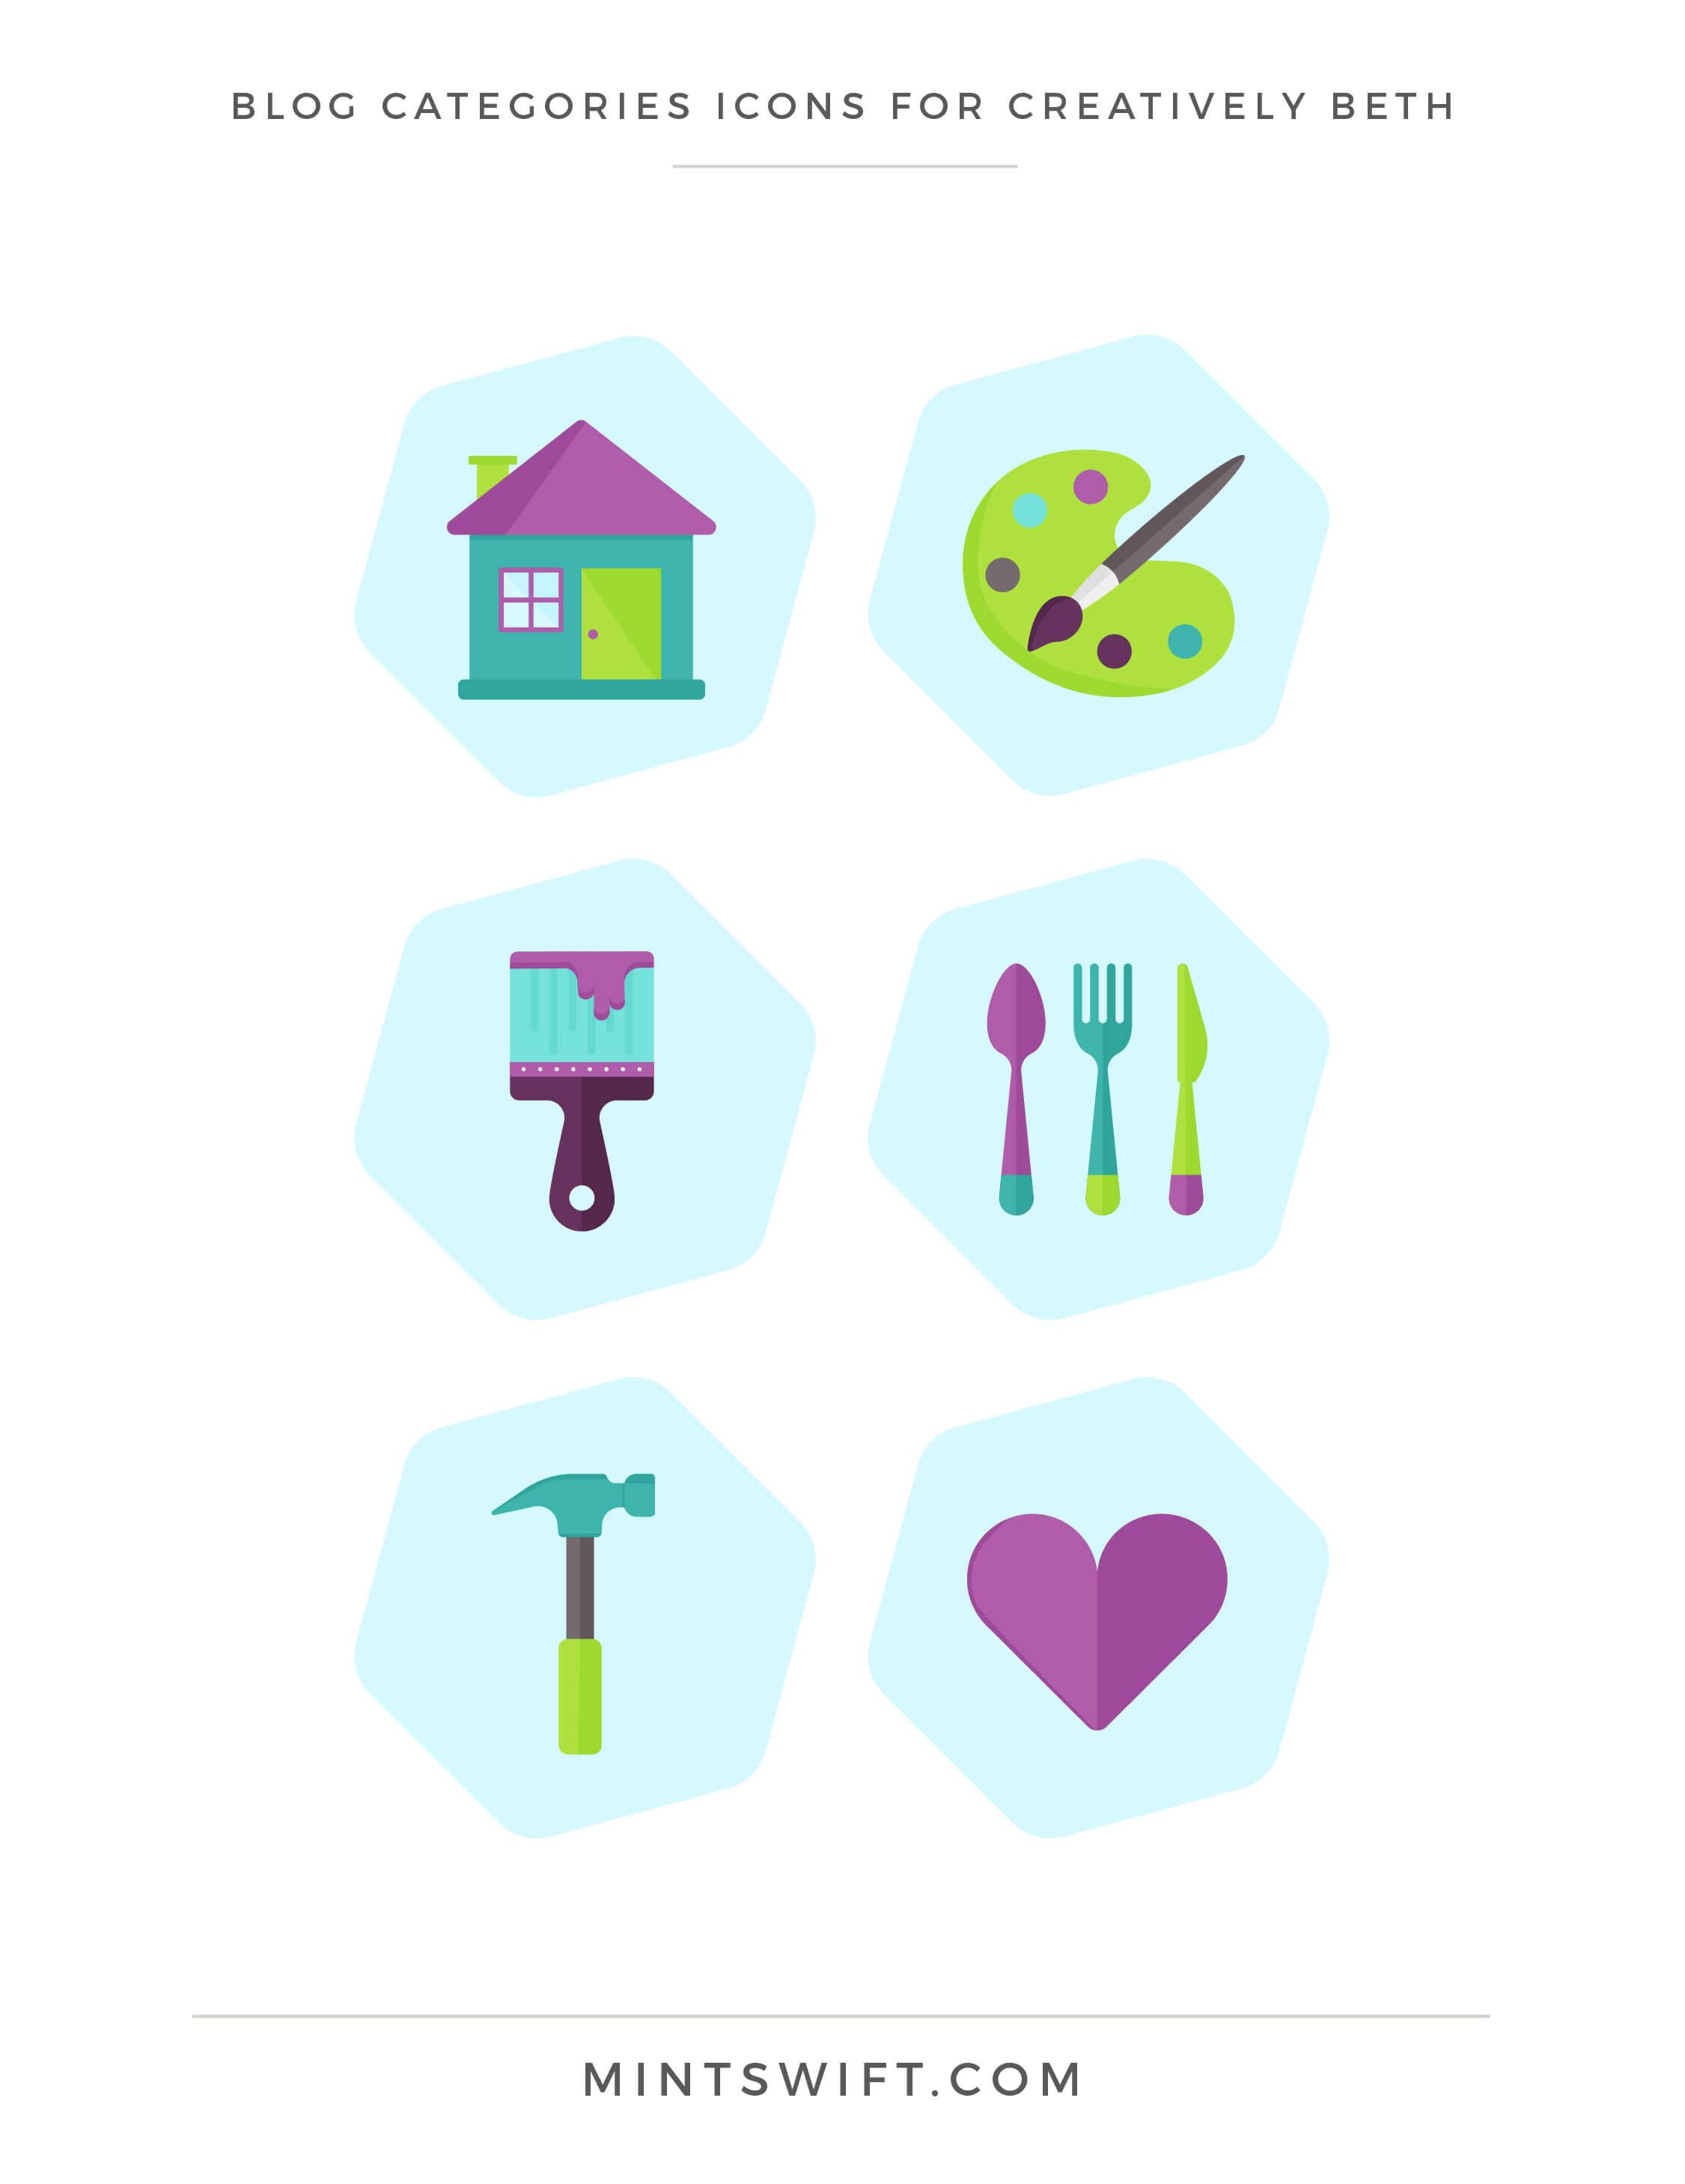 Creatively Beth - Blog categories icons - Brand & Website Design - MintSwift